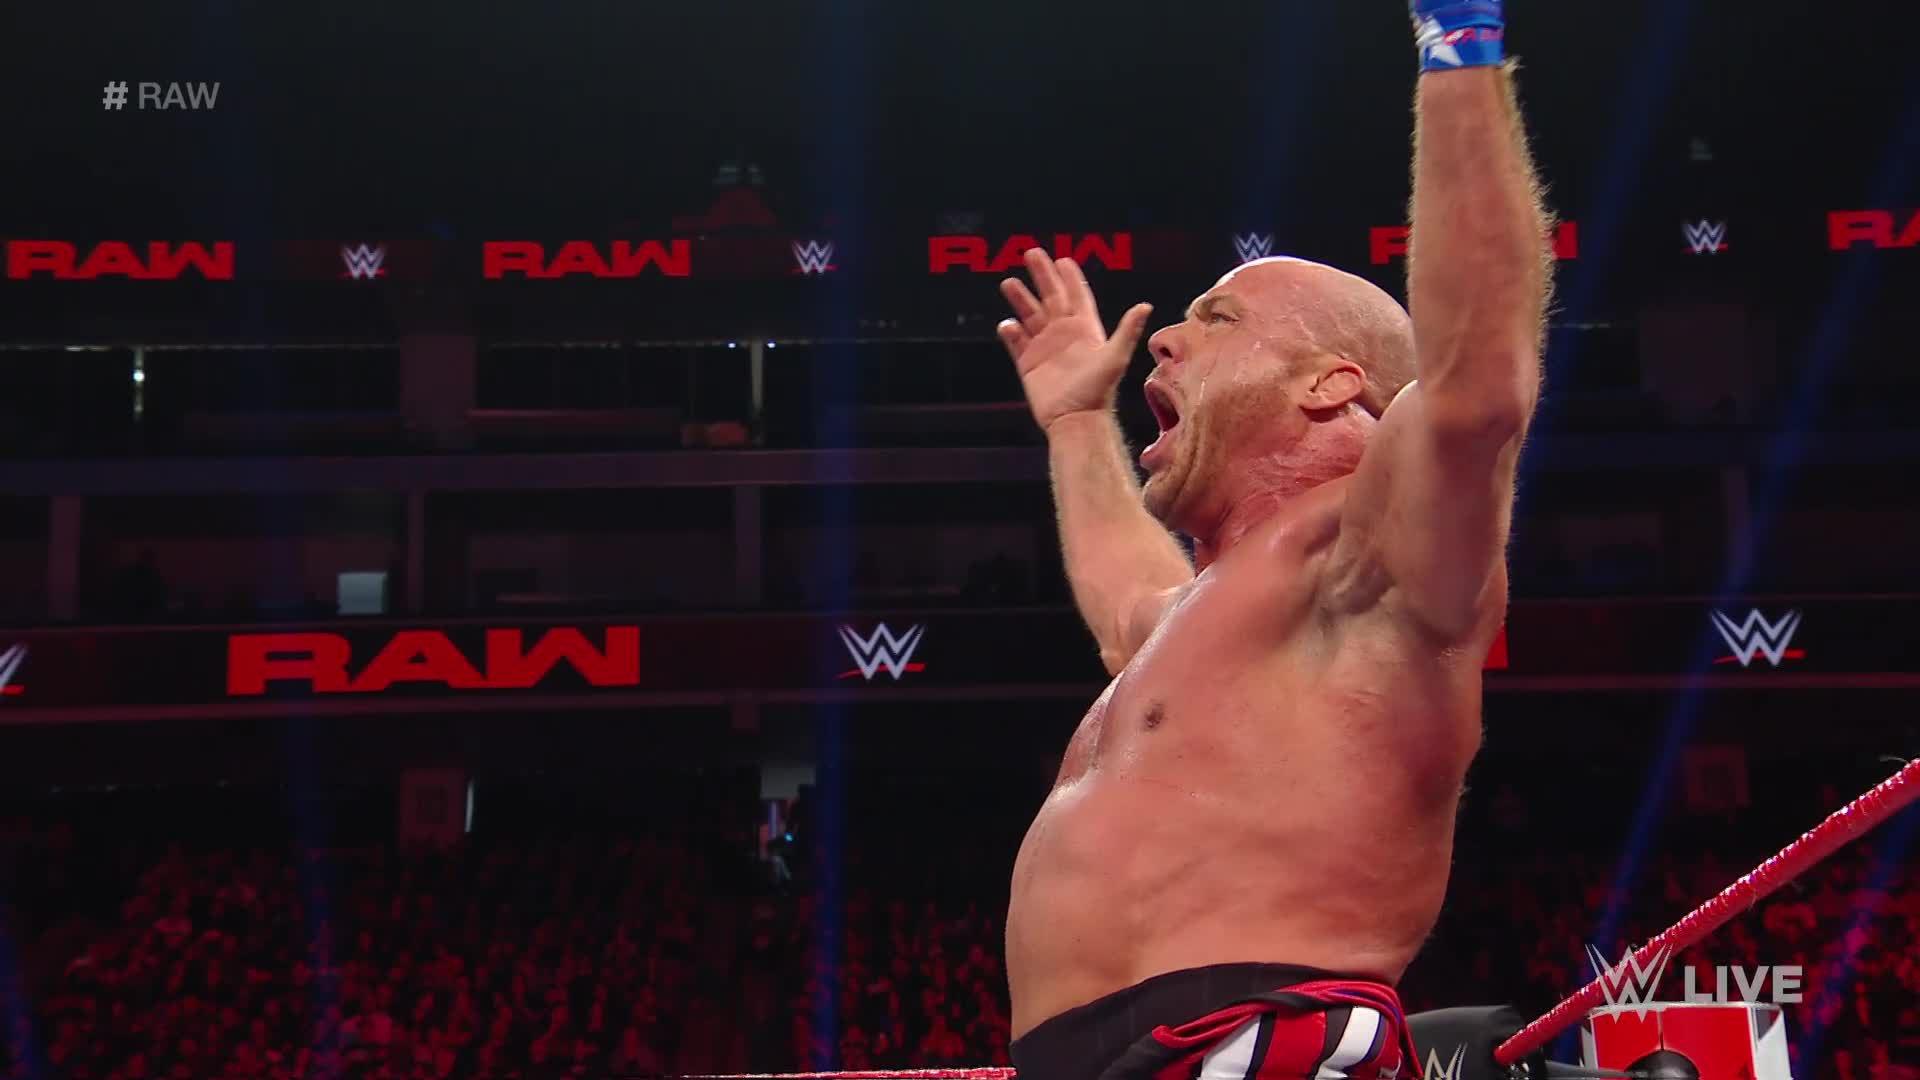 Kurt Angle, Bobby Roode, Chad Gable & Apollo Crews vs. Baron Corbin - No Disqualification 4-on-1 Handicap Match: Raw, Dec. 17, 2018